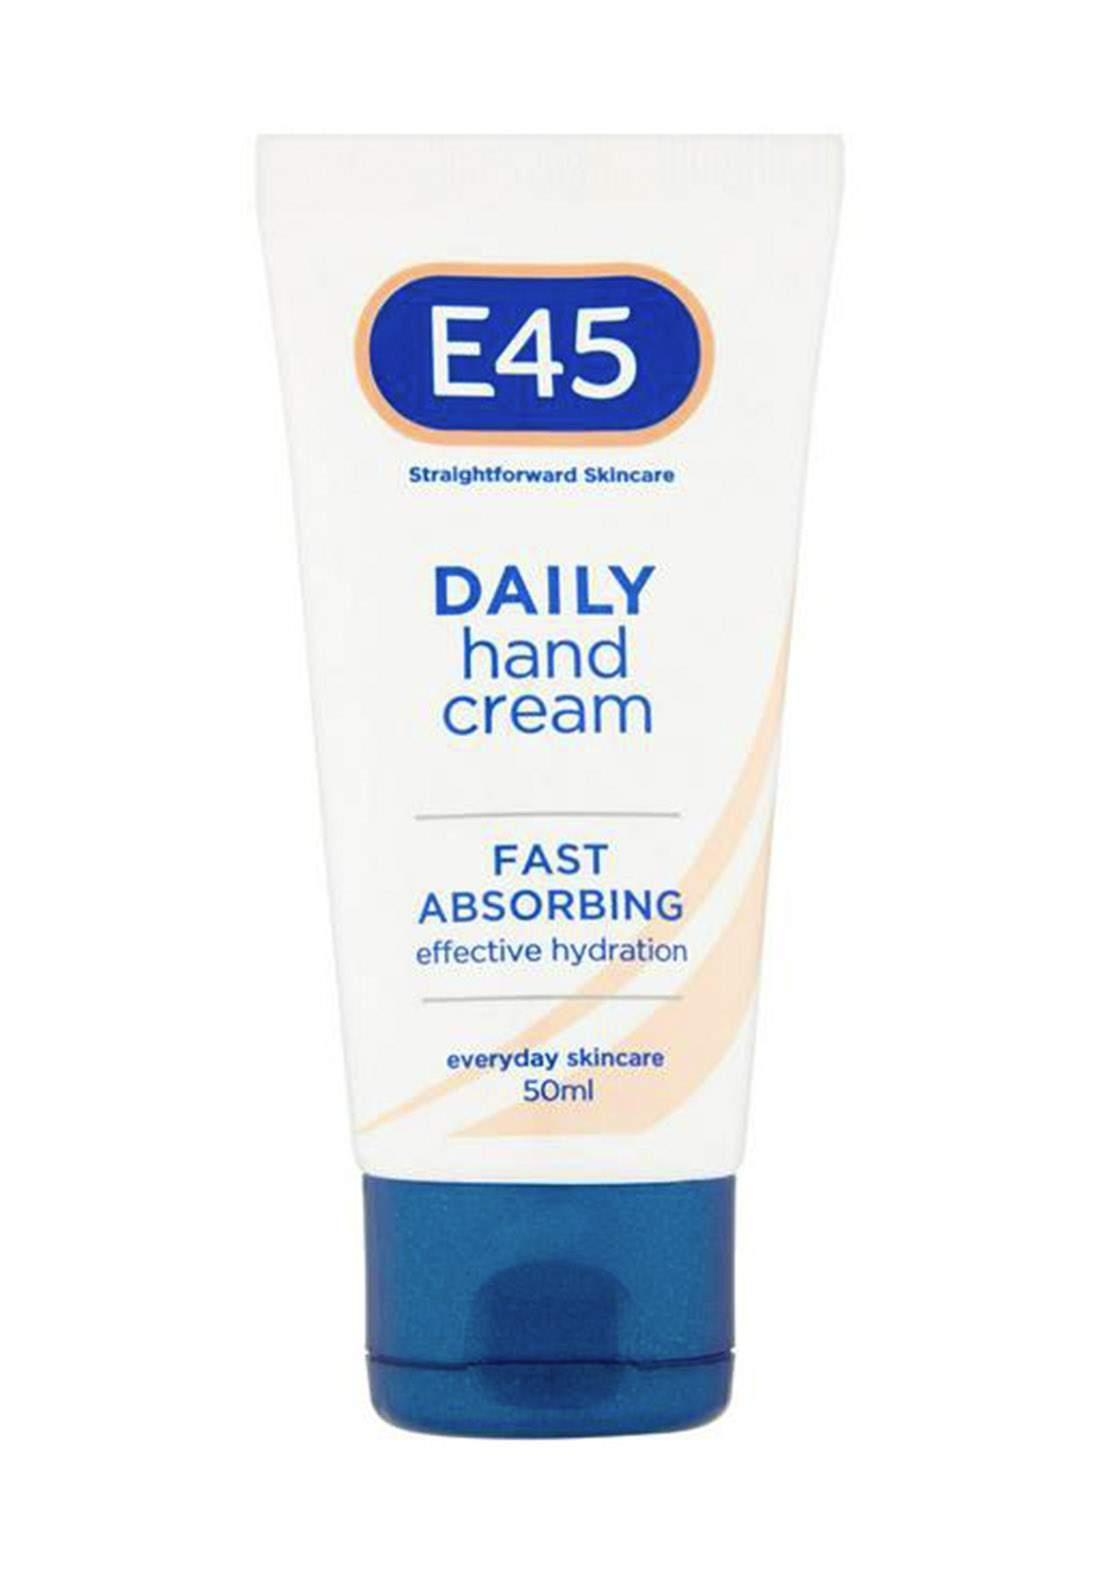 E45 (0155w) Daily Fast Absorption Moisturiser Hand Cream For Dry Skin 50ml مرطب اليدين